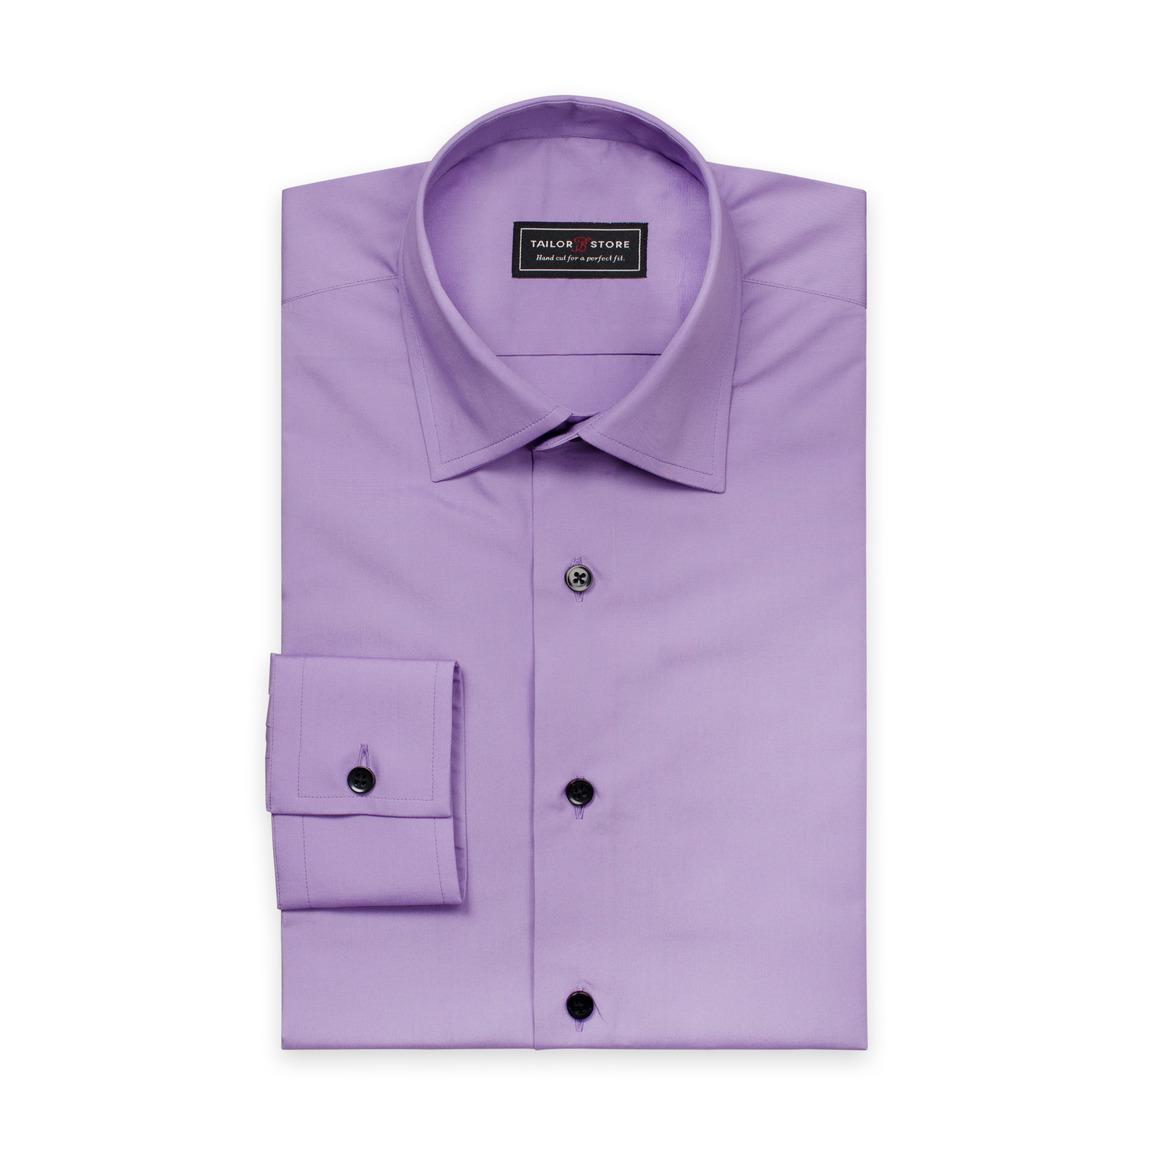 Lila poplinskjorta med business krage